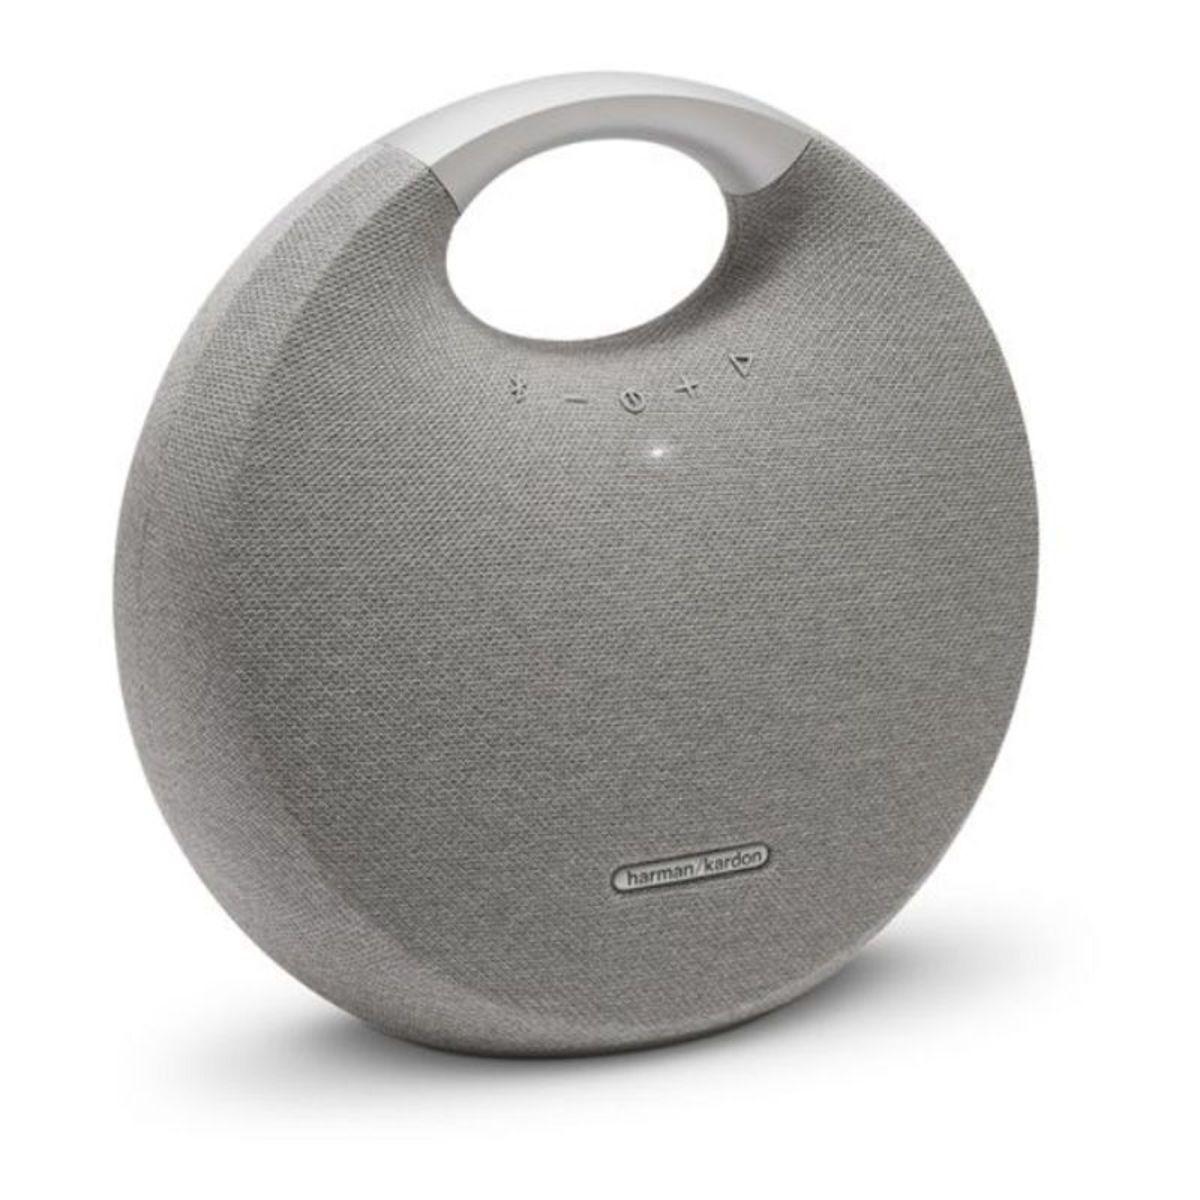 Onyx Studio 5 Wireless Portable Bluetooth Speaker GREY【HK Authorised Dealer Product】